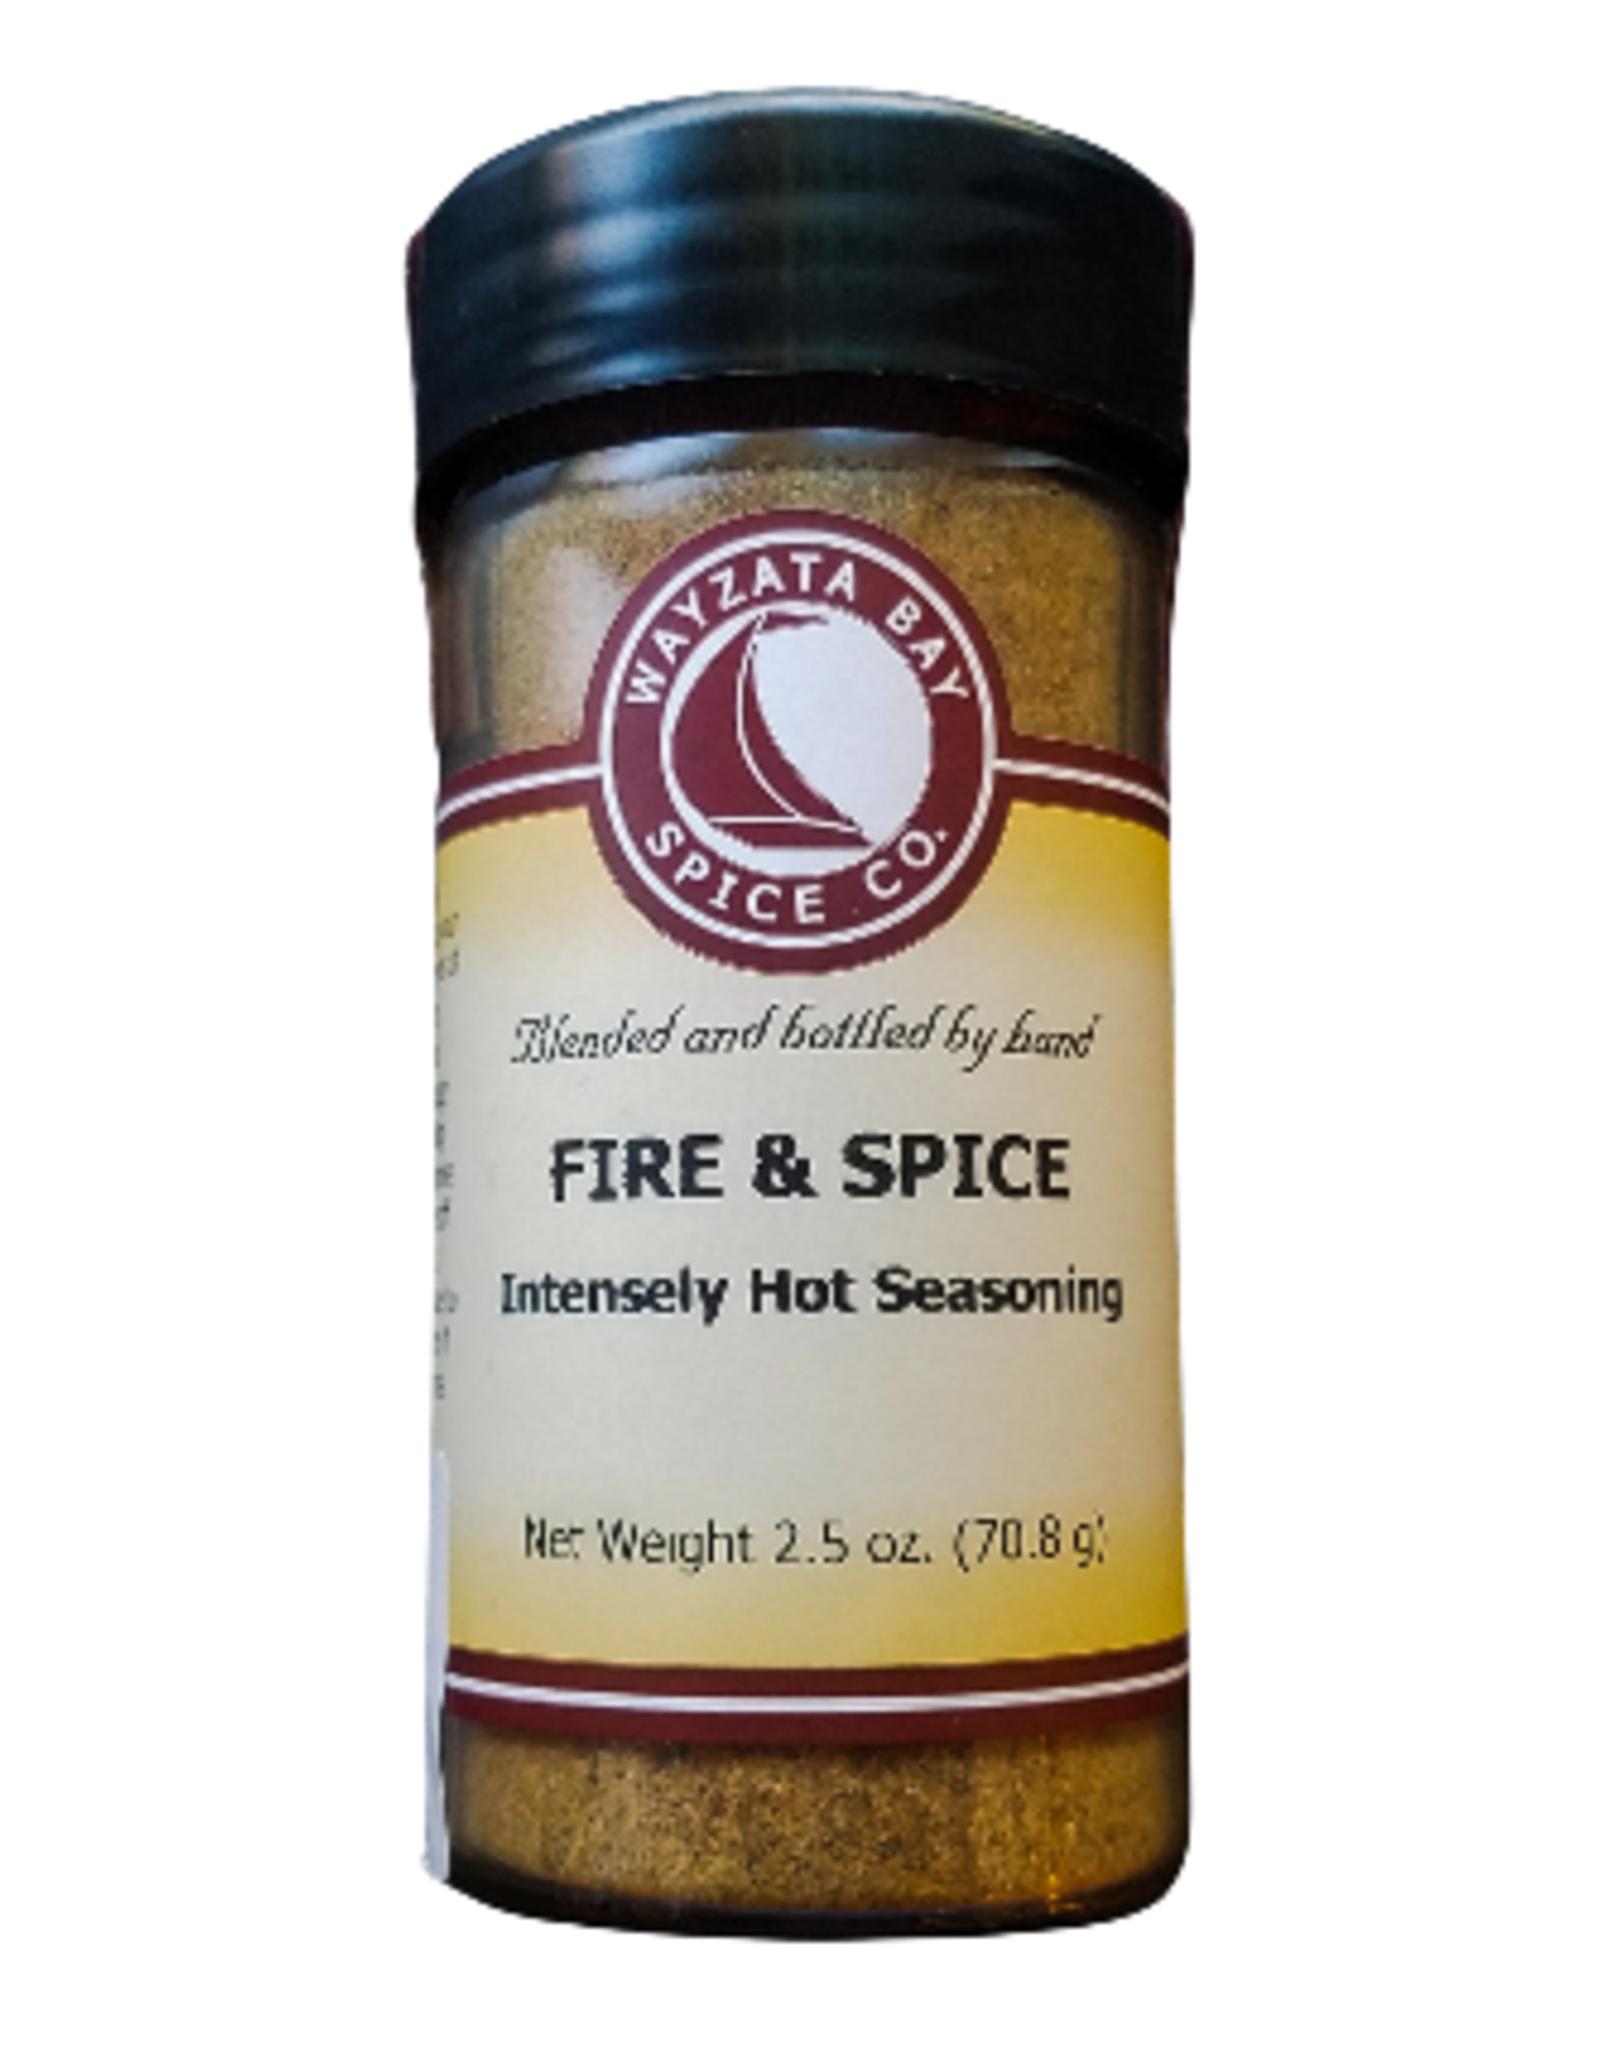 Wayzata Bay Spice Co. Fire and Spice